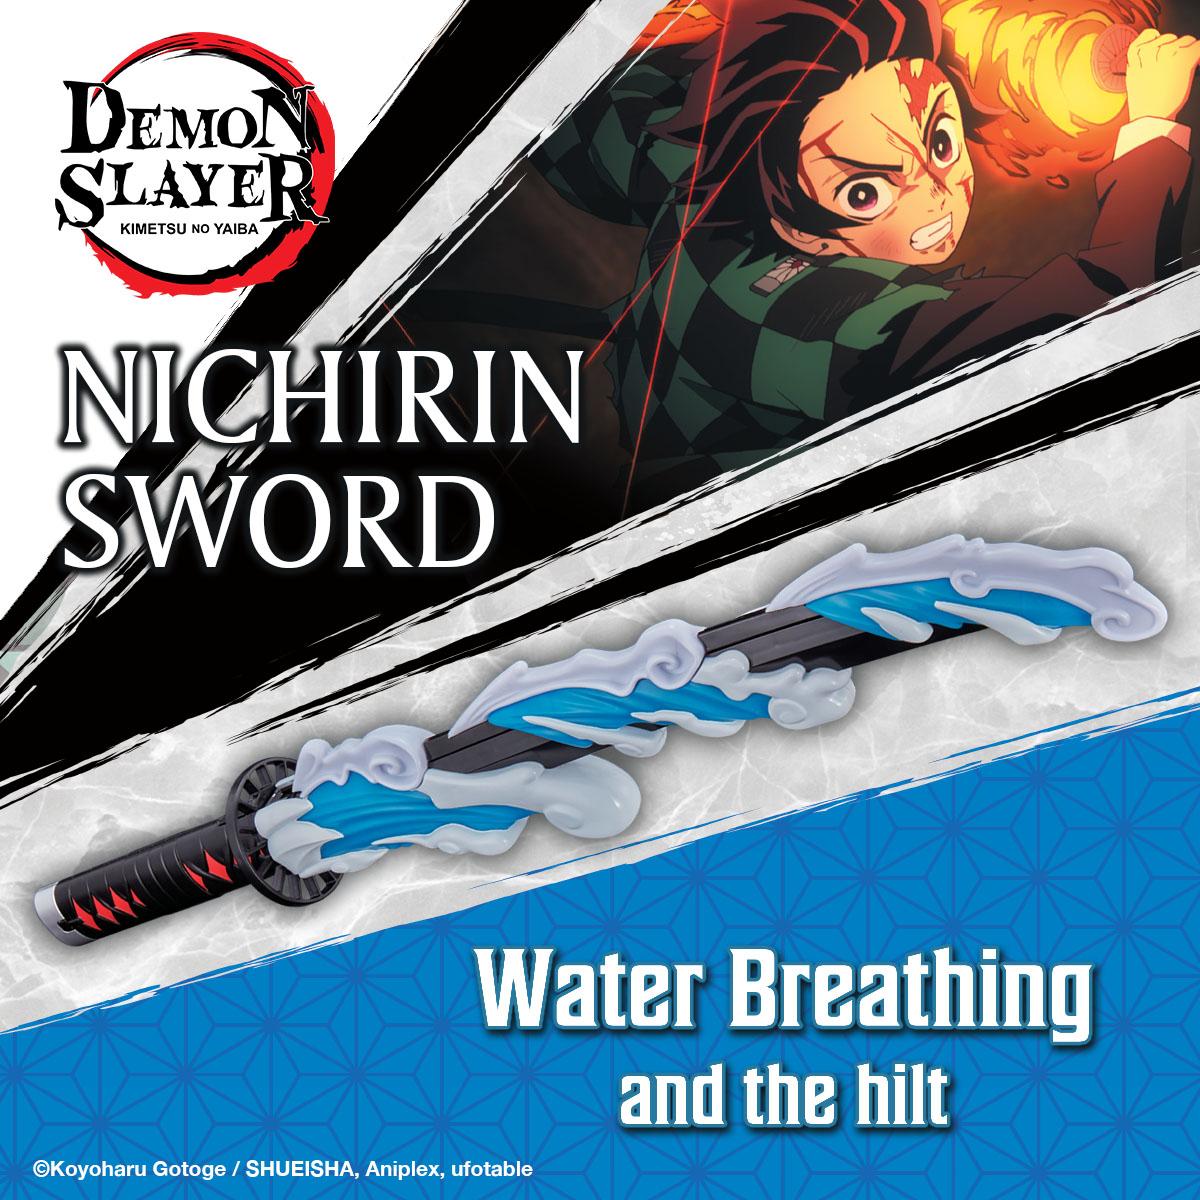 Demon Slayer DX Nichirin Sword   [July 2021 Delivery]